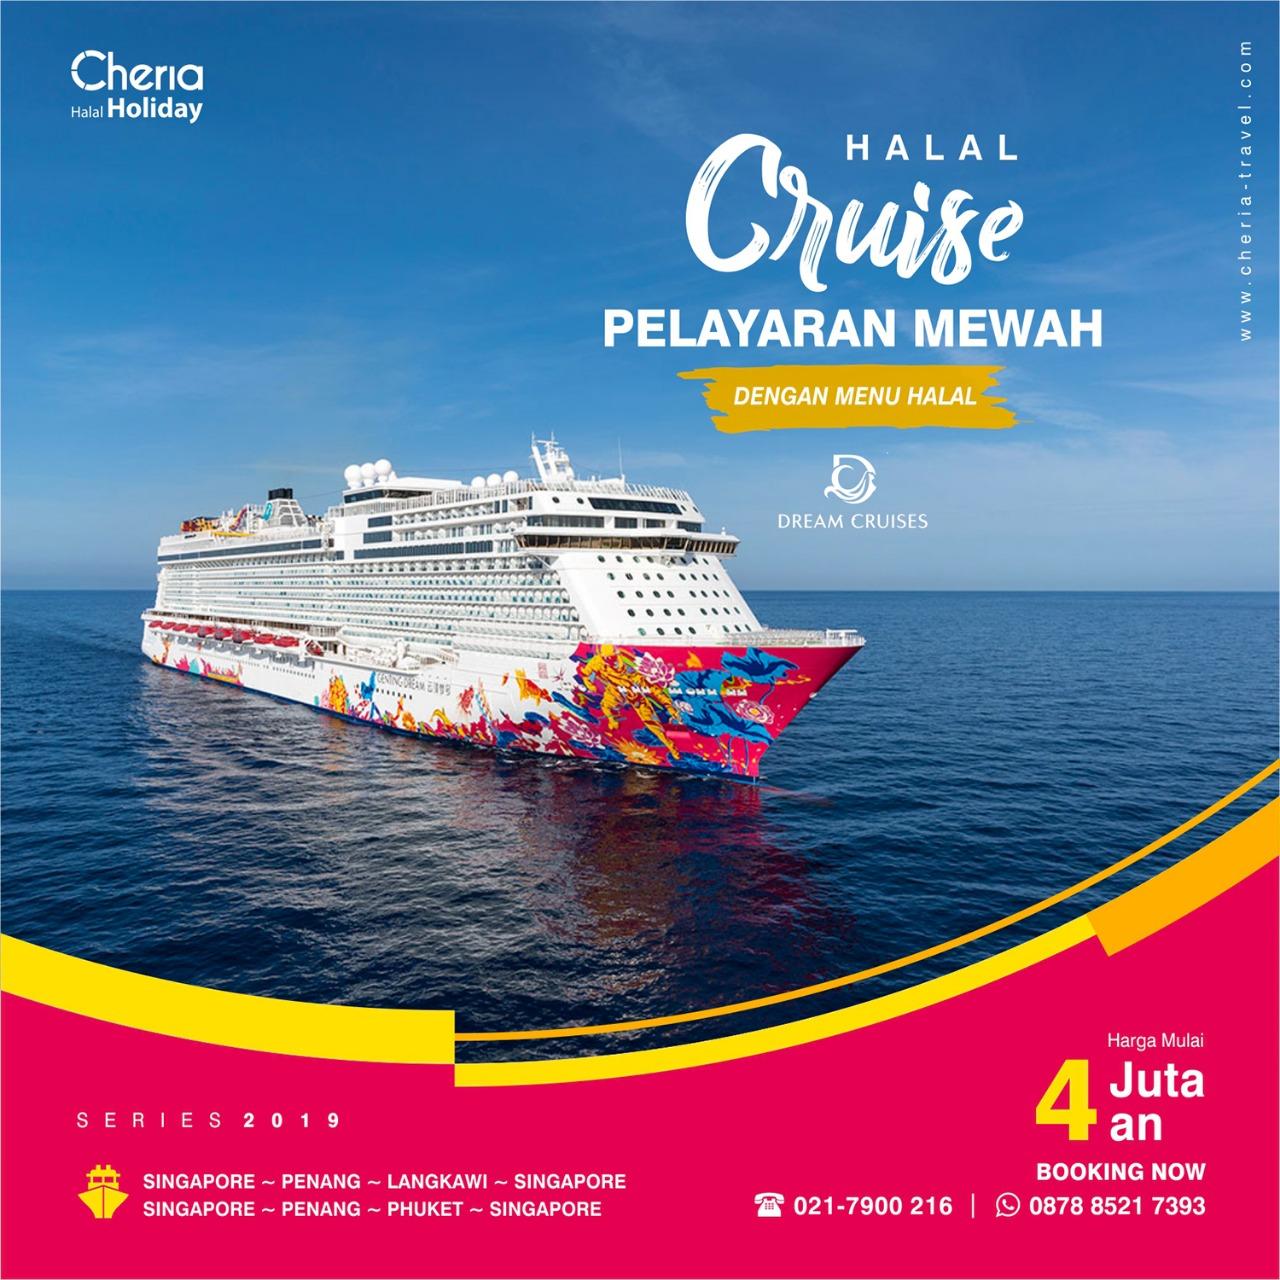 halal cruise cheria holiday